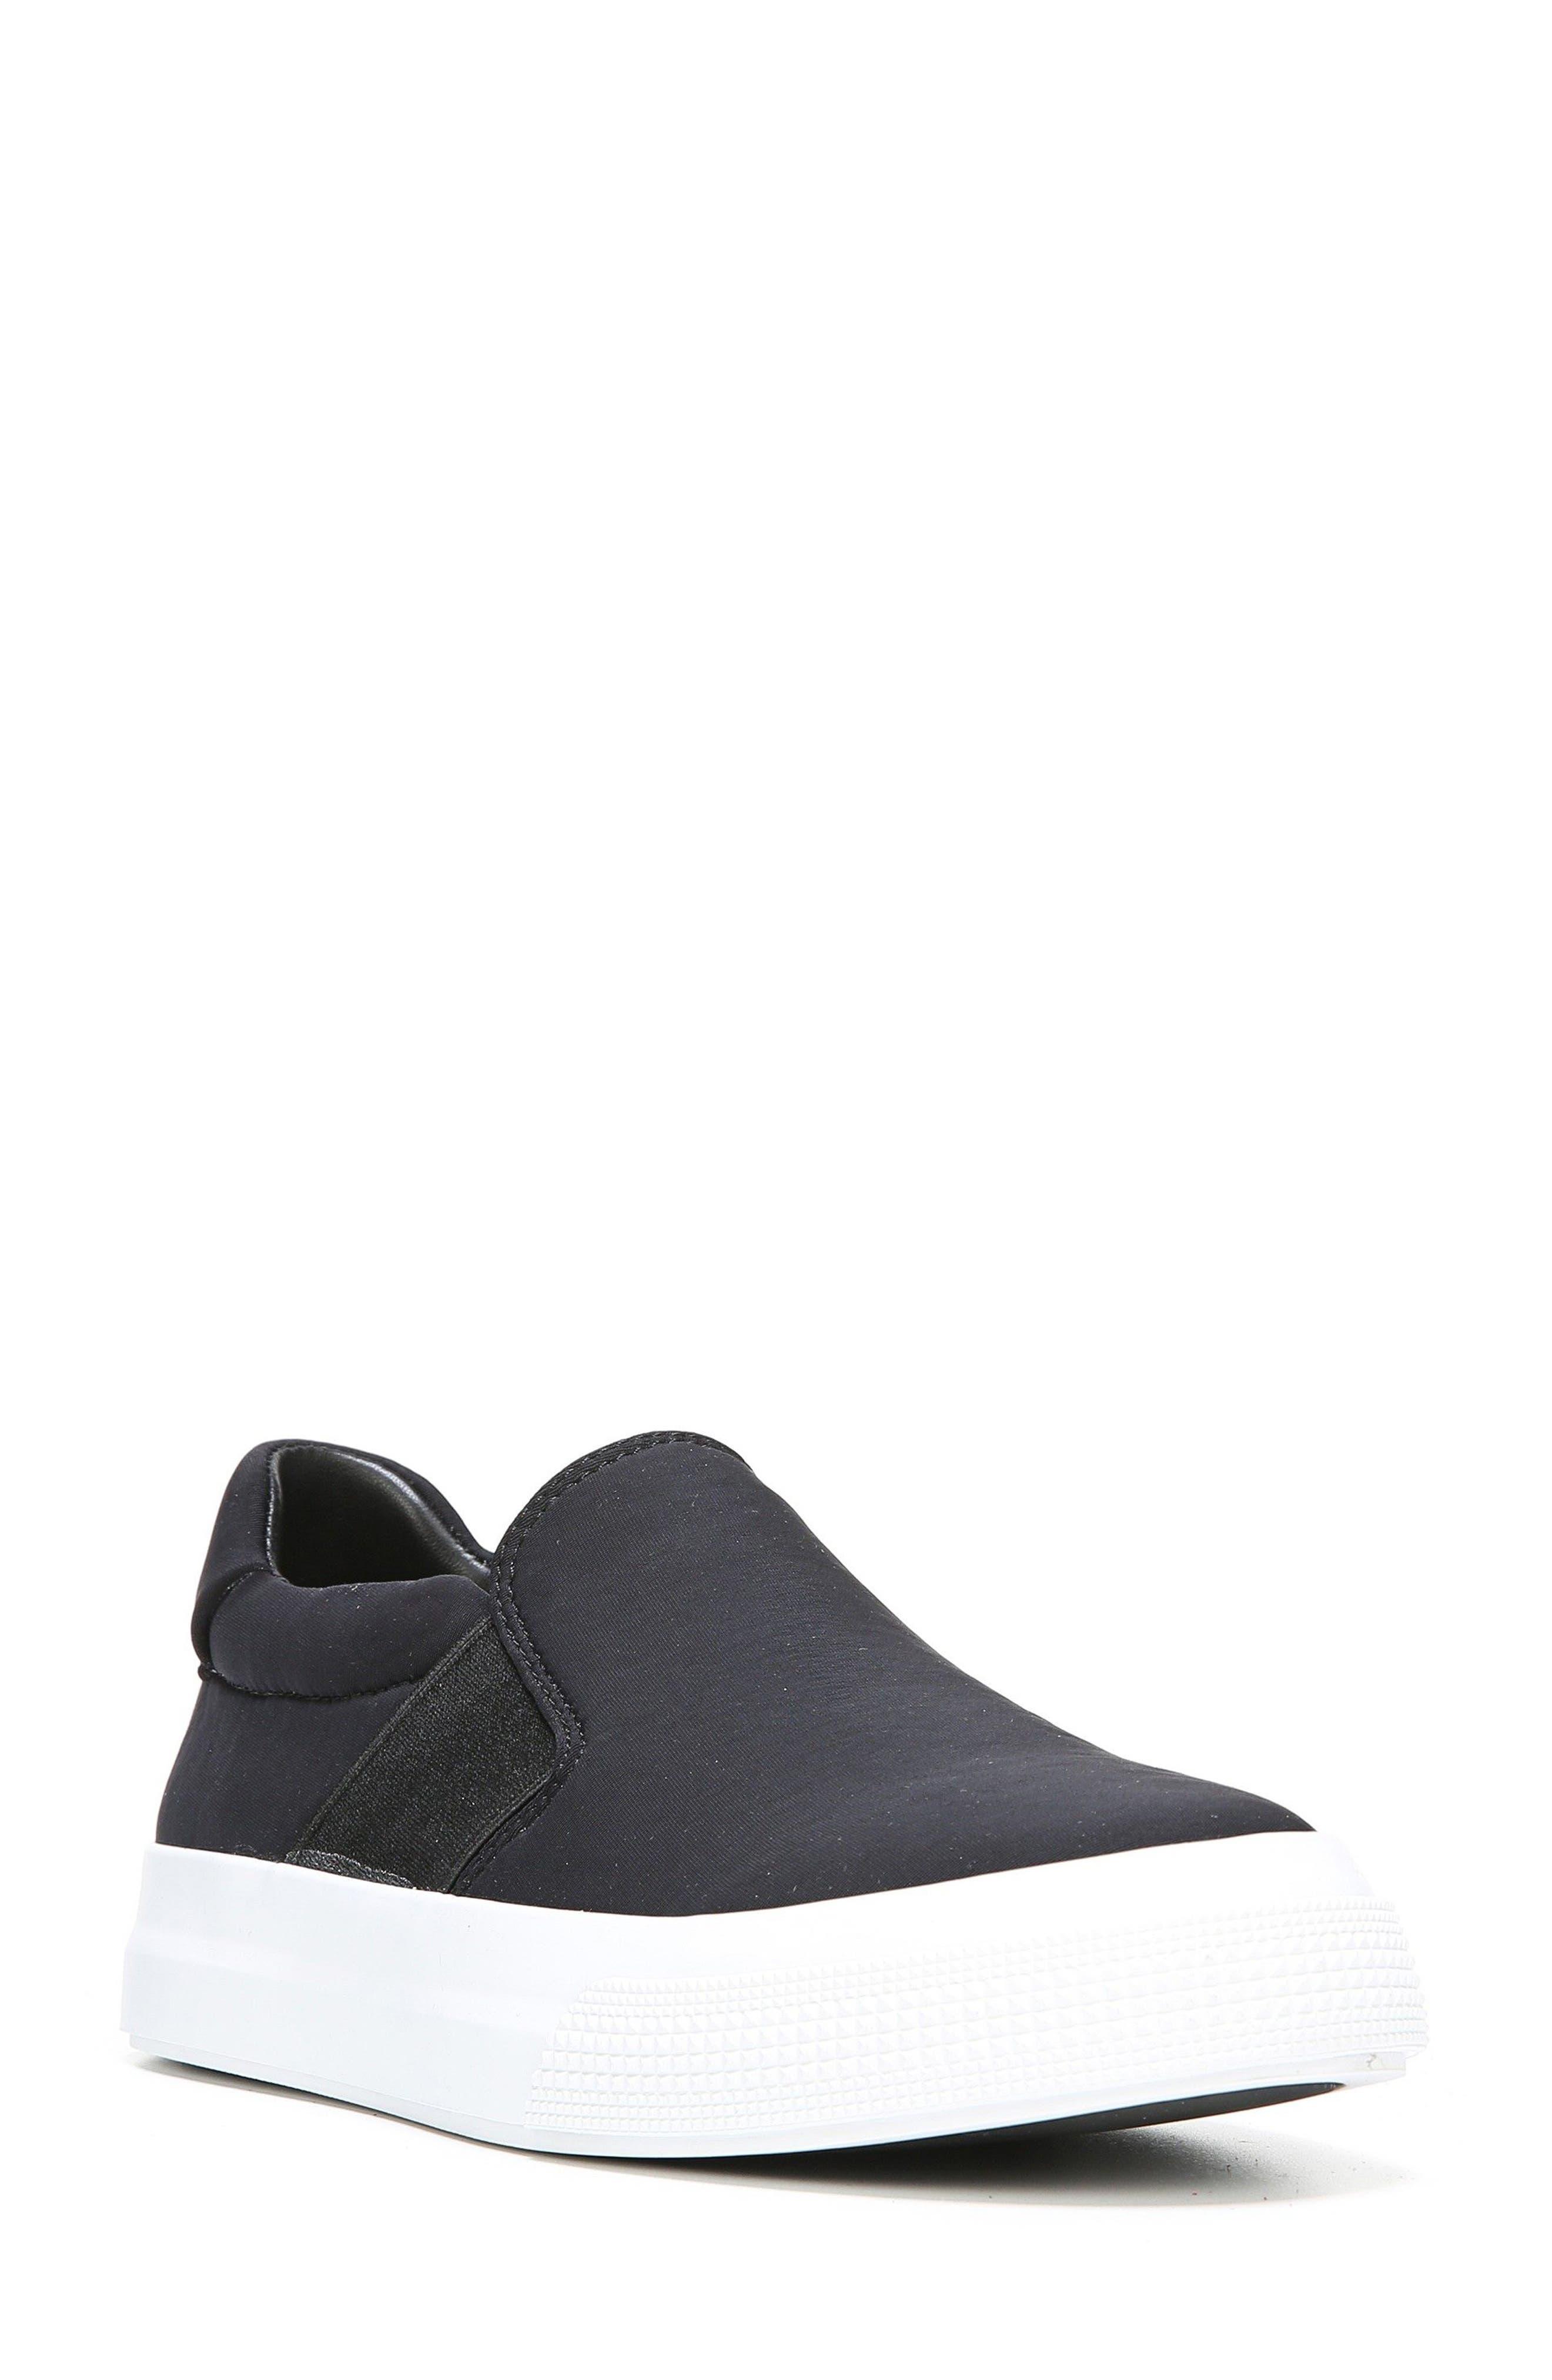 Torin Slip-On Sneaker,                         Main,                         color, Black